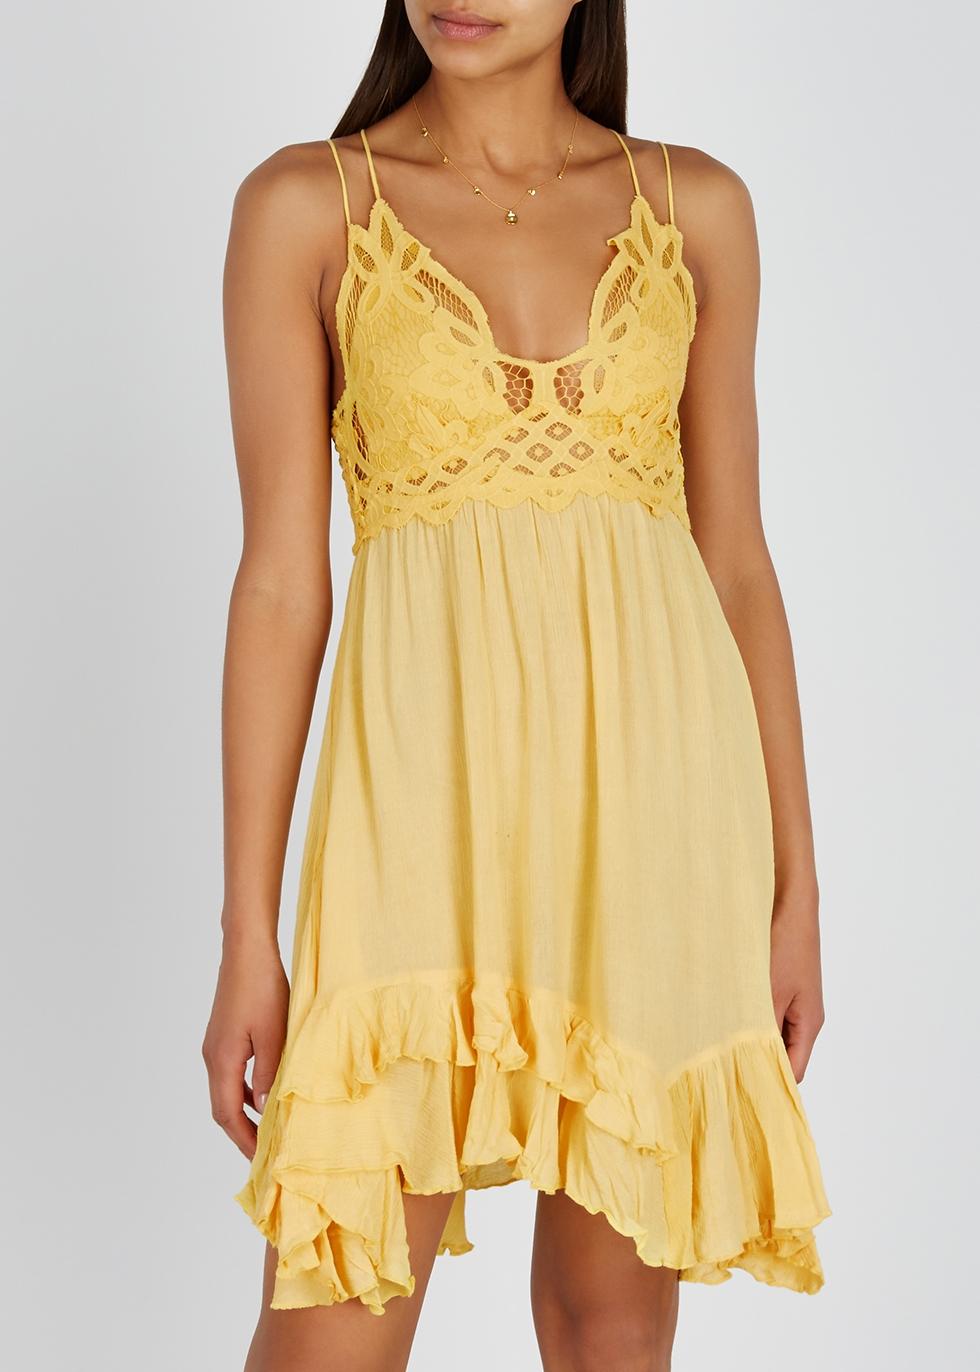 Adella yellow lace-trimmed mini dress - Free People